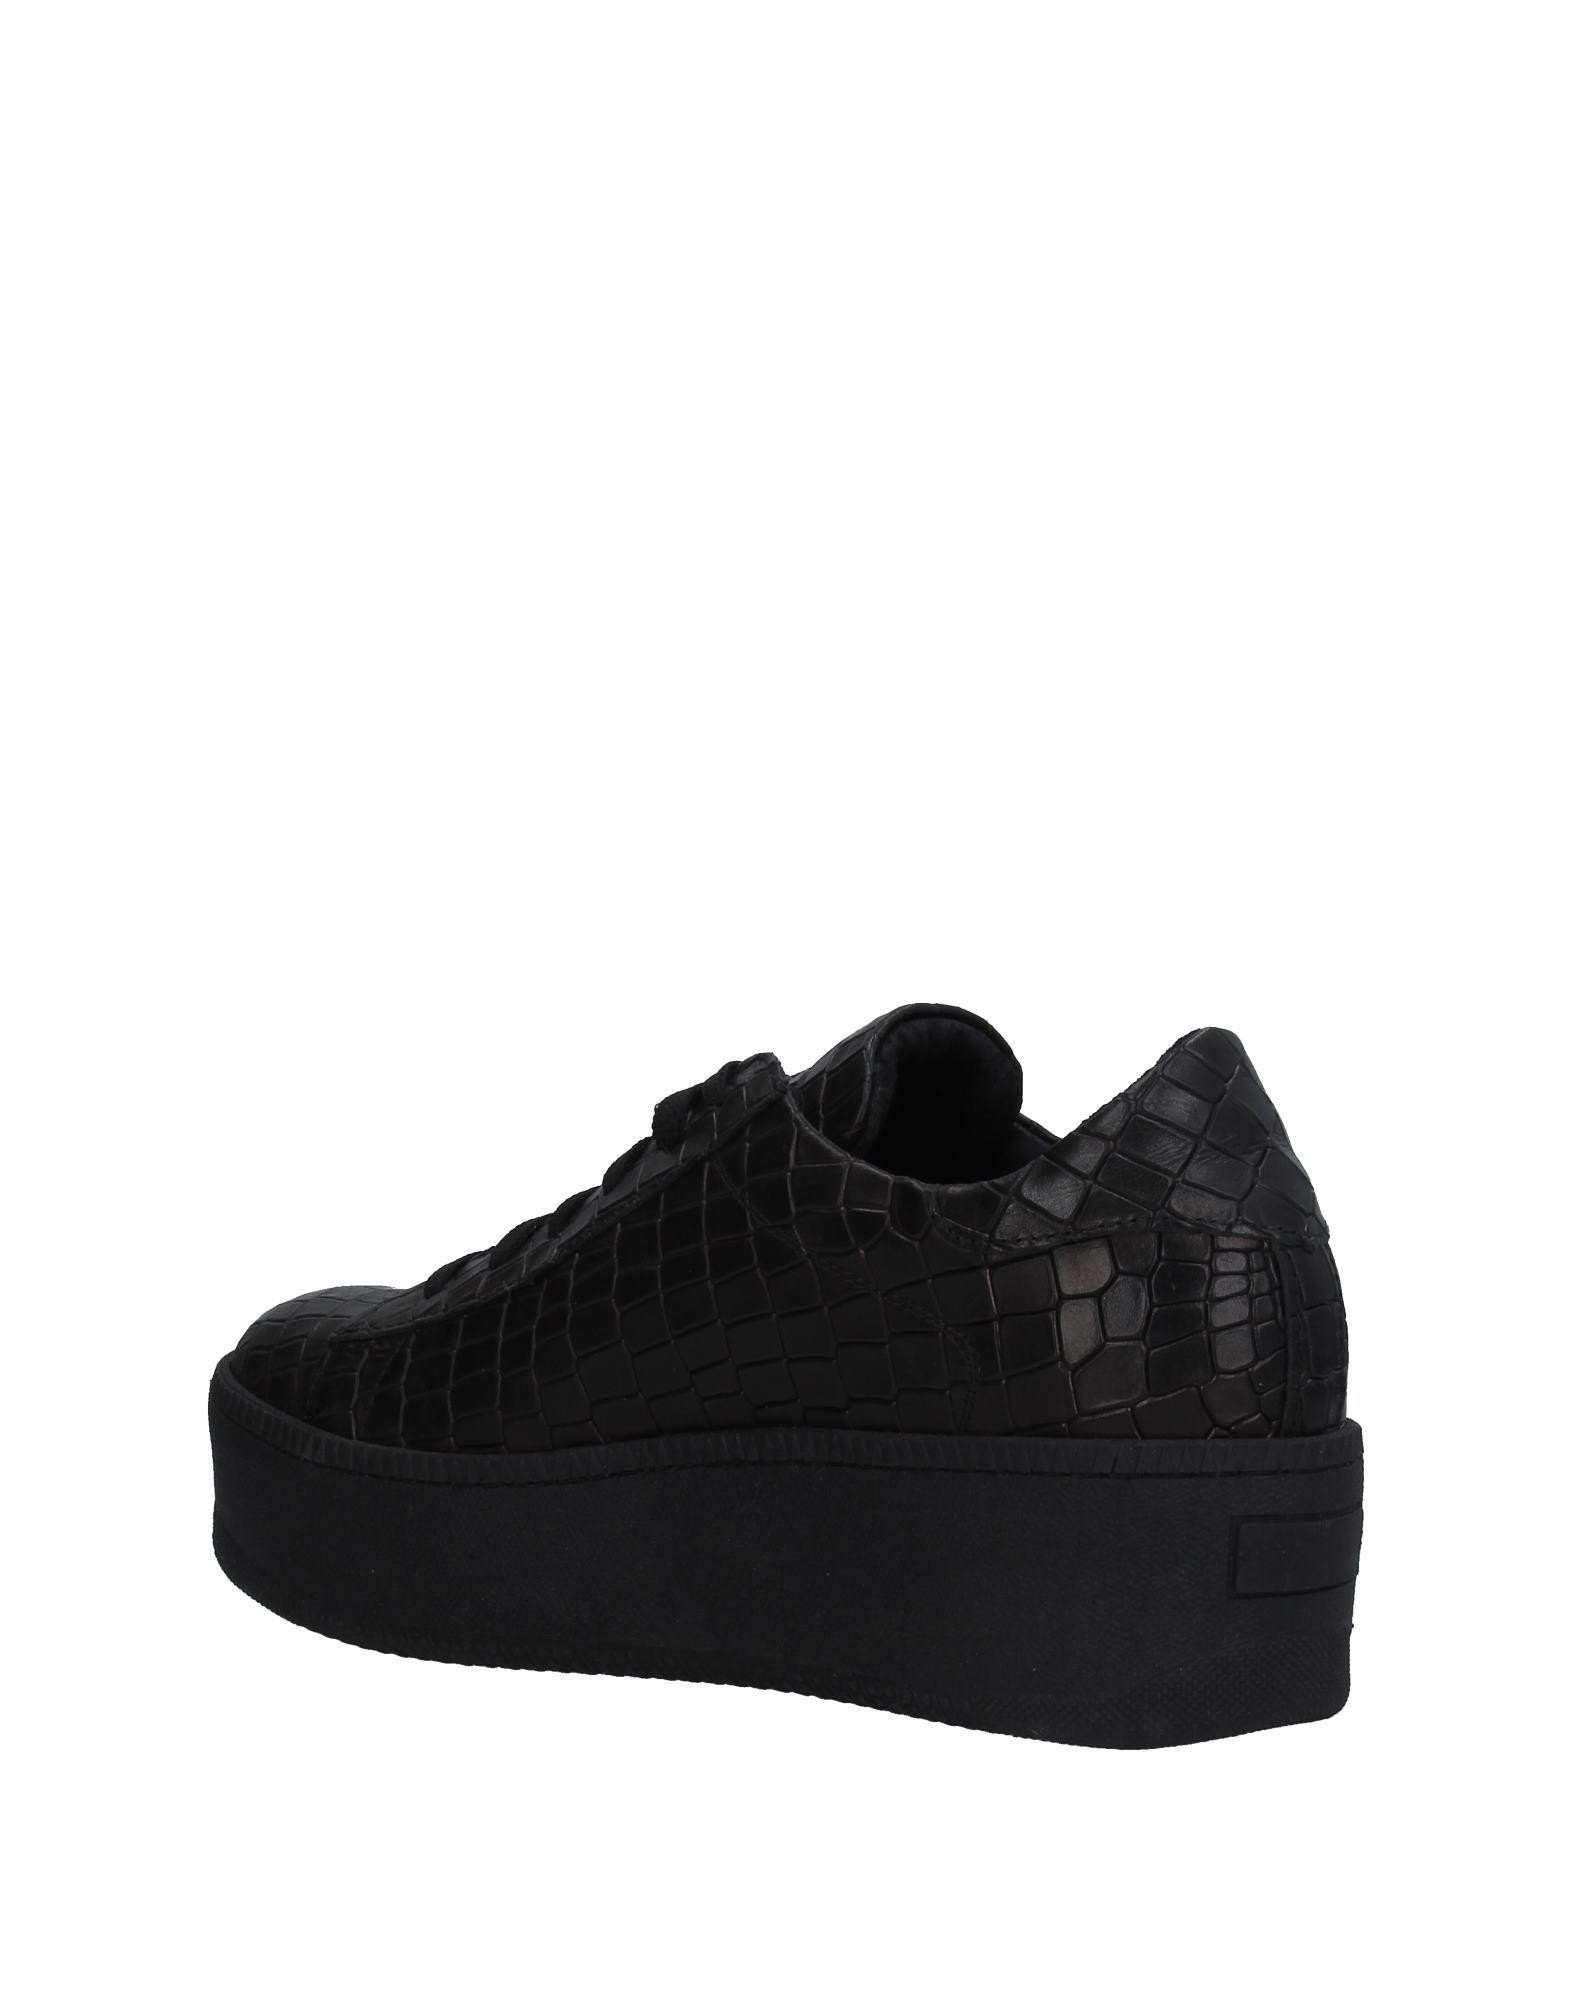 Unlace Sneakers Damen  11270041HA Schuhe Gute Qualität beliebte Schuhe 11270041HA b4326f